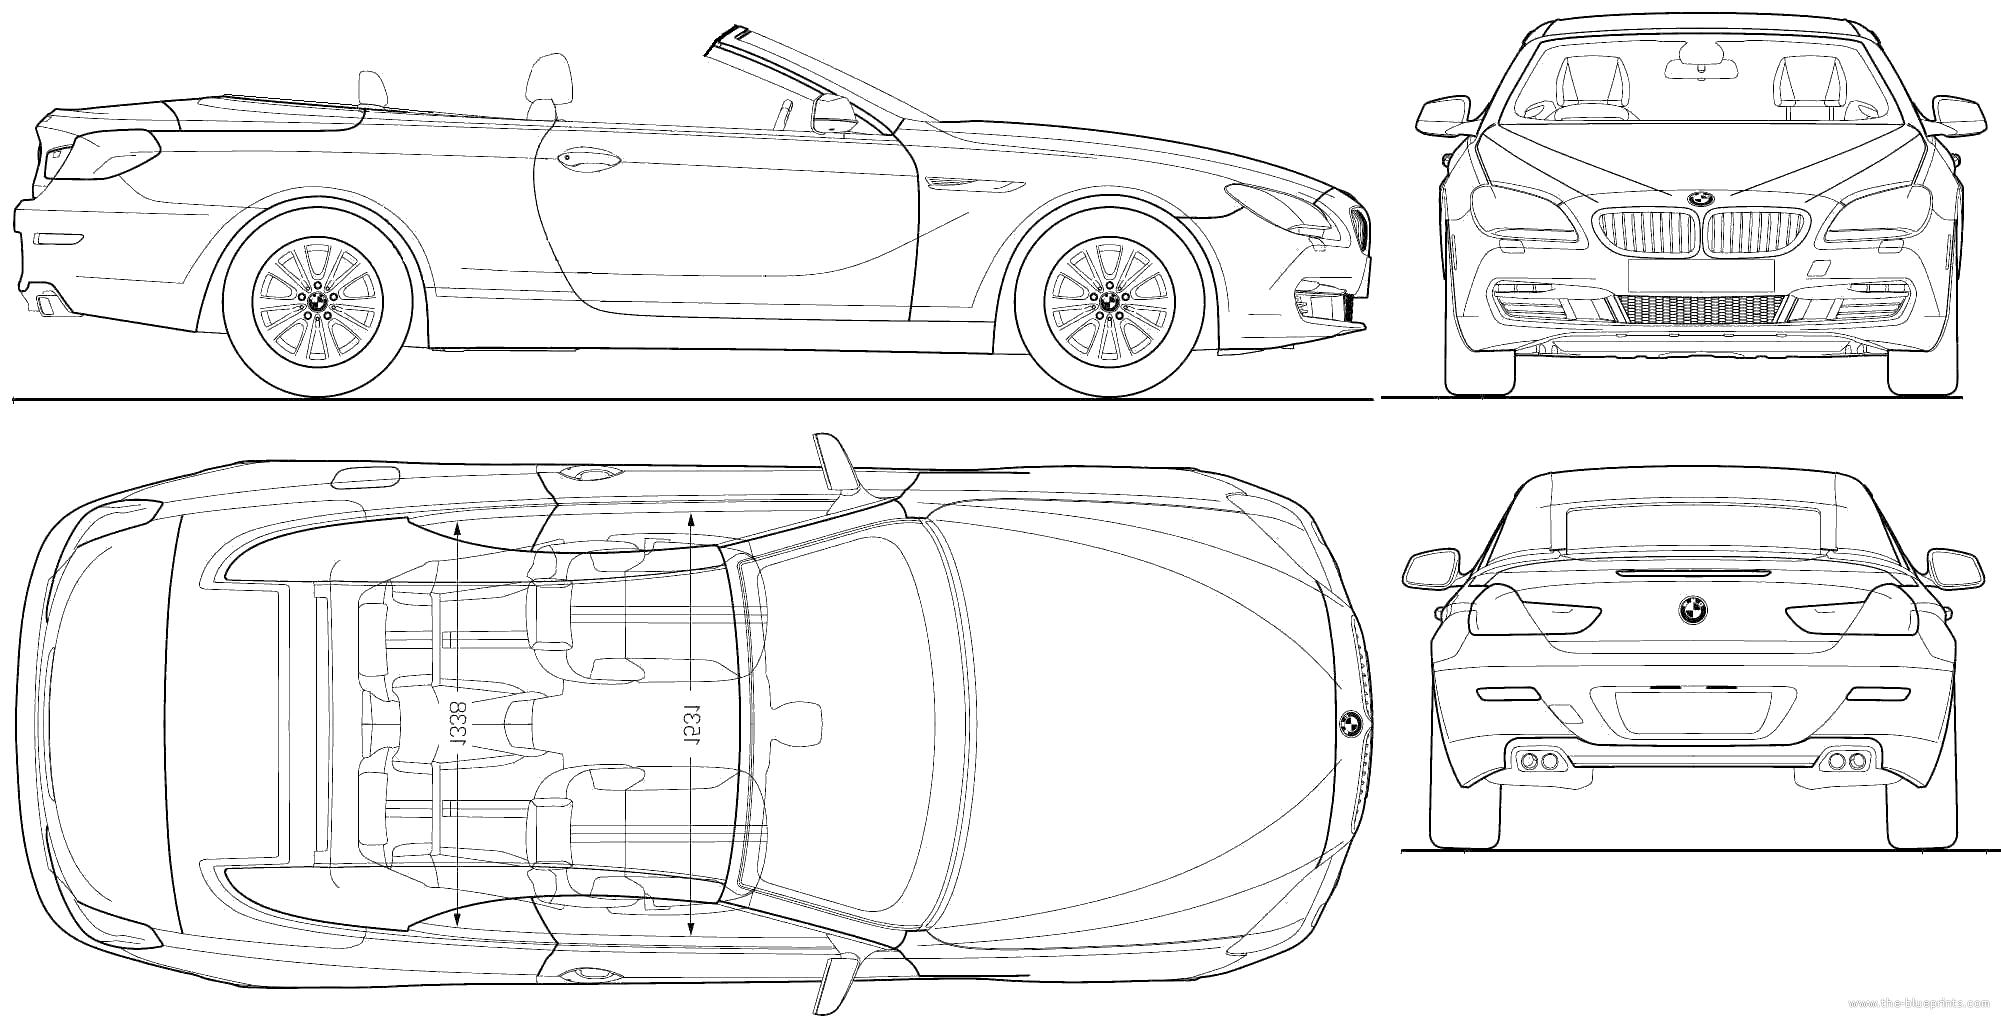 Blueprints > Cars > BMW > BMW 6-Series Convertible (F12